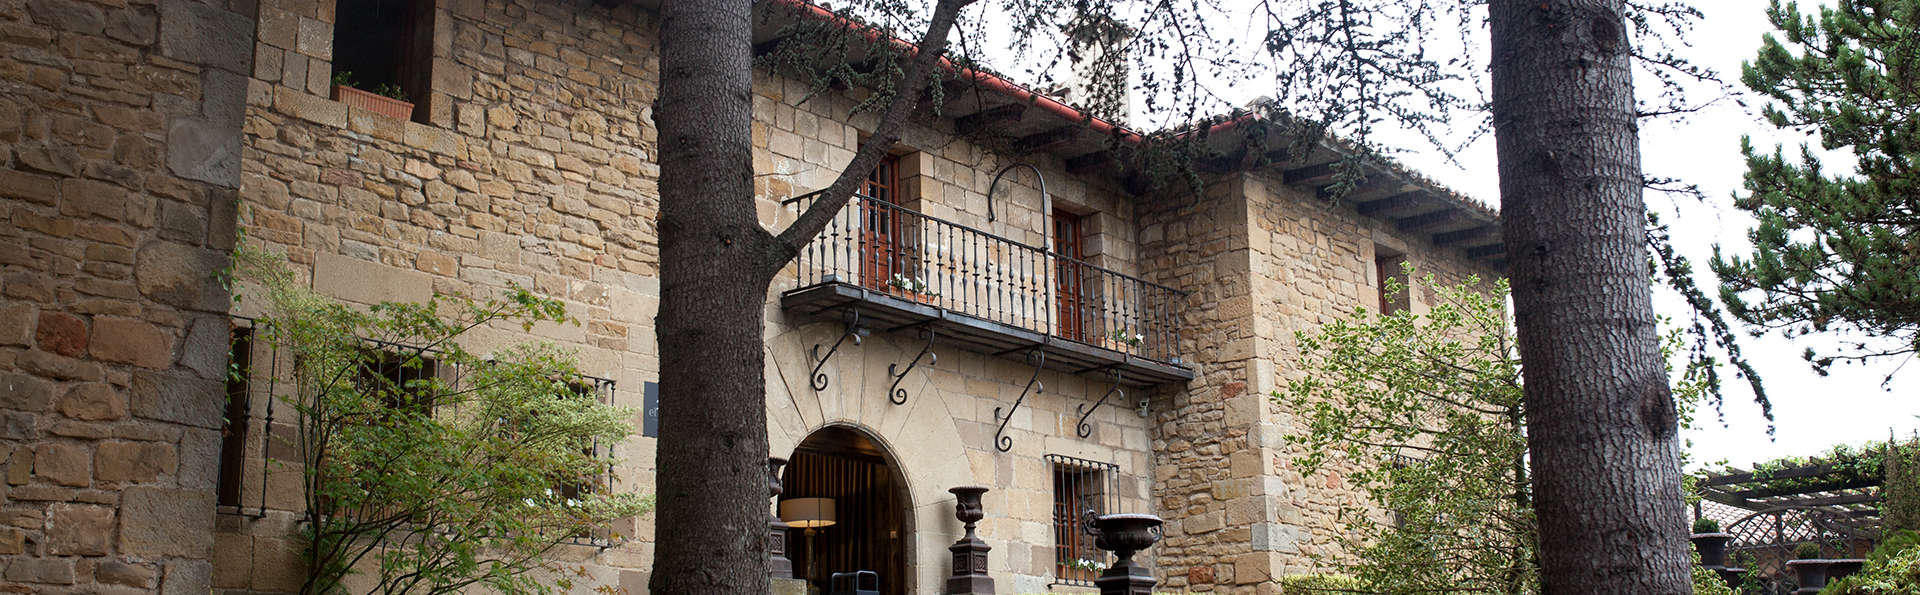 Pamplona El Toro Hotel & Spa - EDIT_NEW_front1.jpg